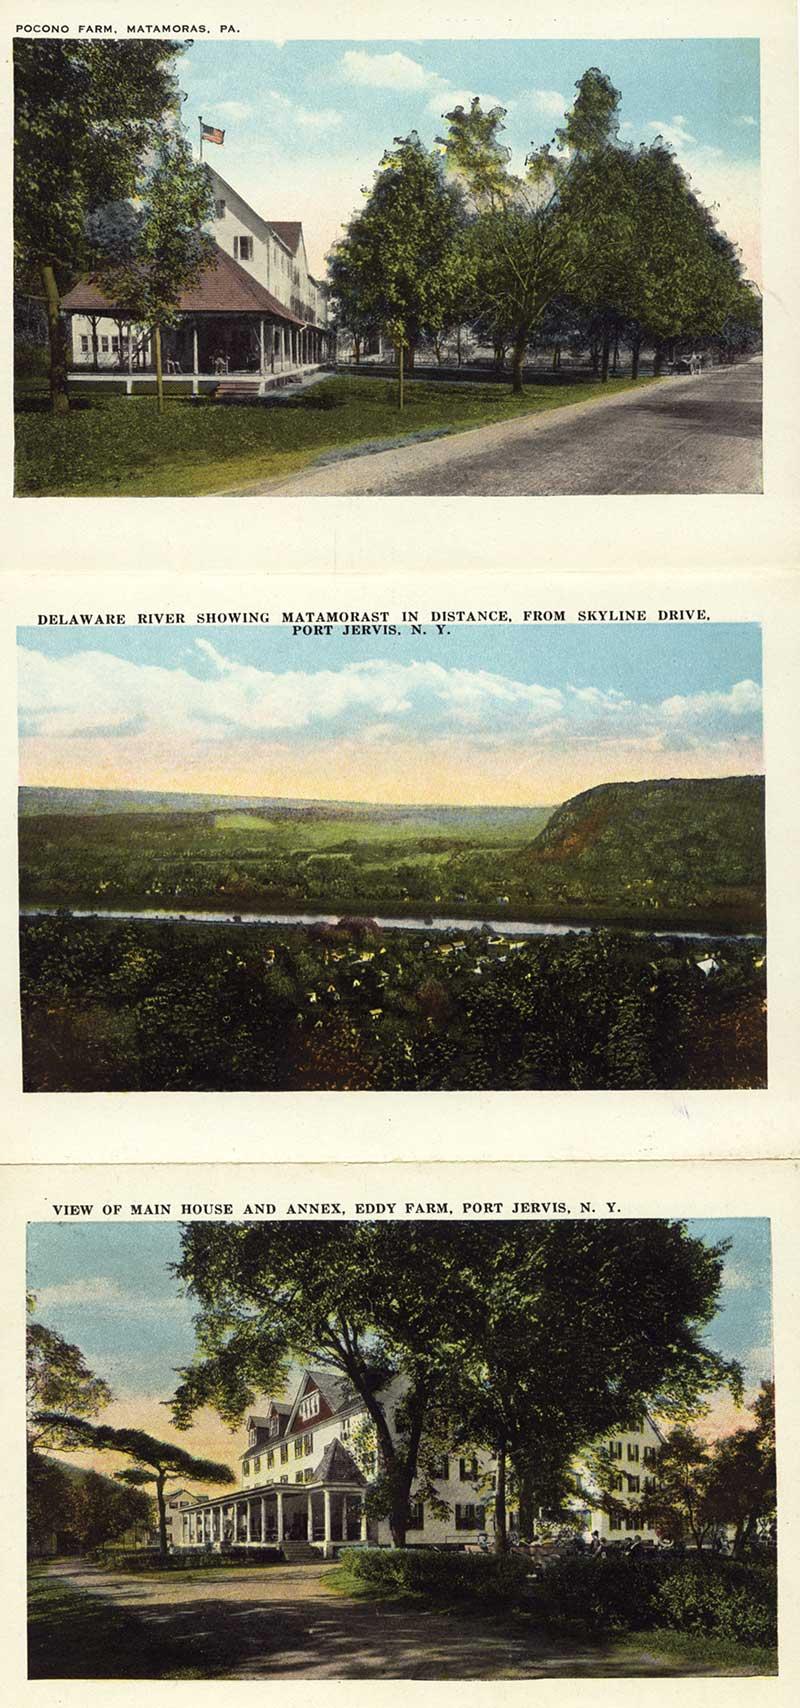 NJ-postcardps-